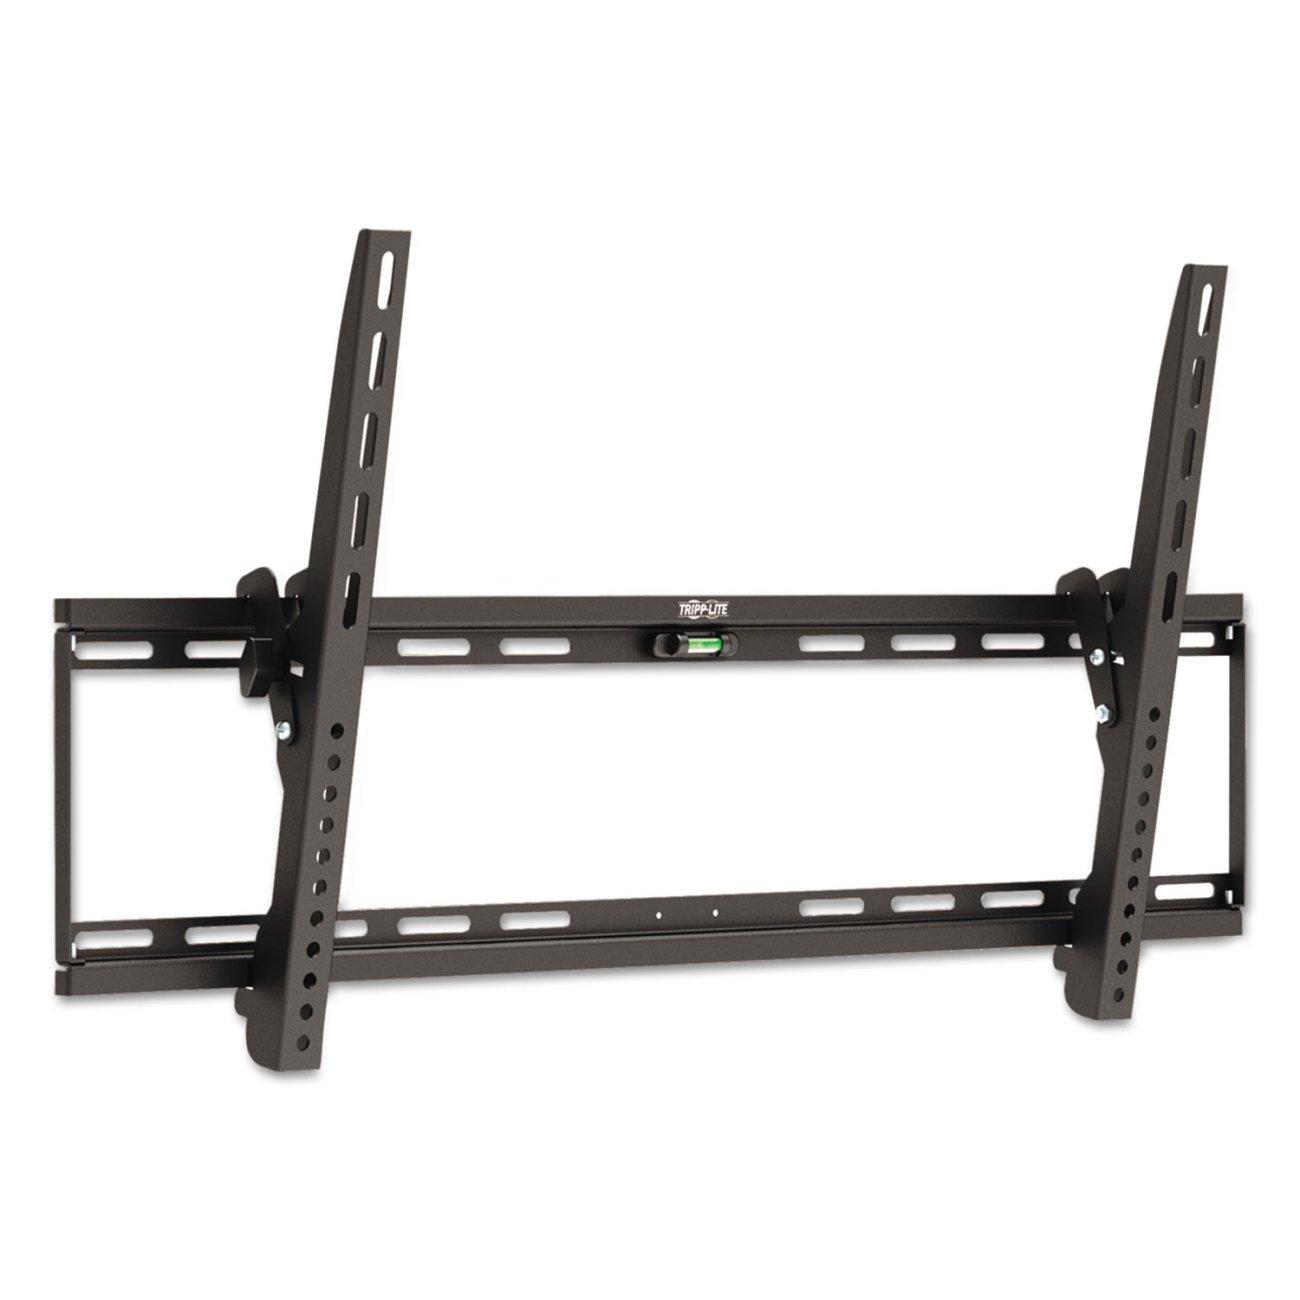 Tripp Lite Tilt Wall Mount for 37'' to 70'' TVs, Monitors, Flat Screens, LED, Plasma or LCD Displays (DWT3770X)